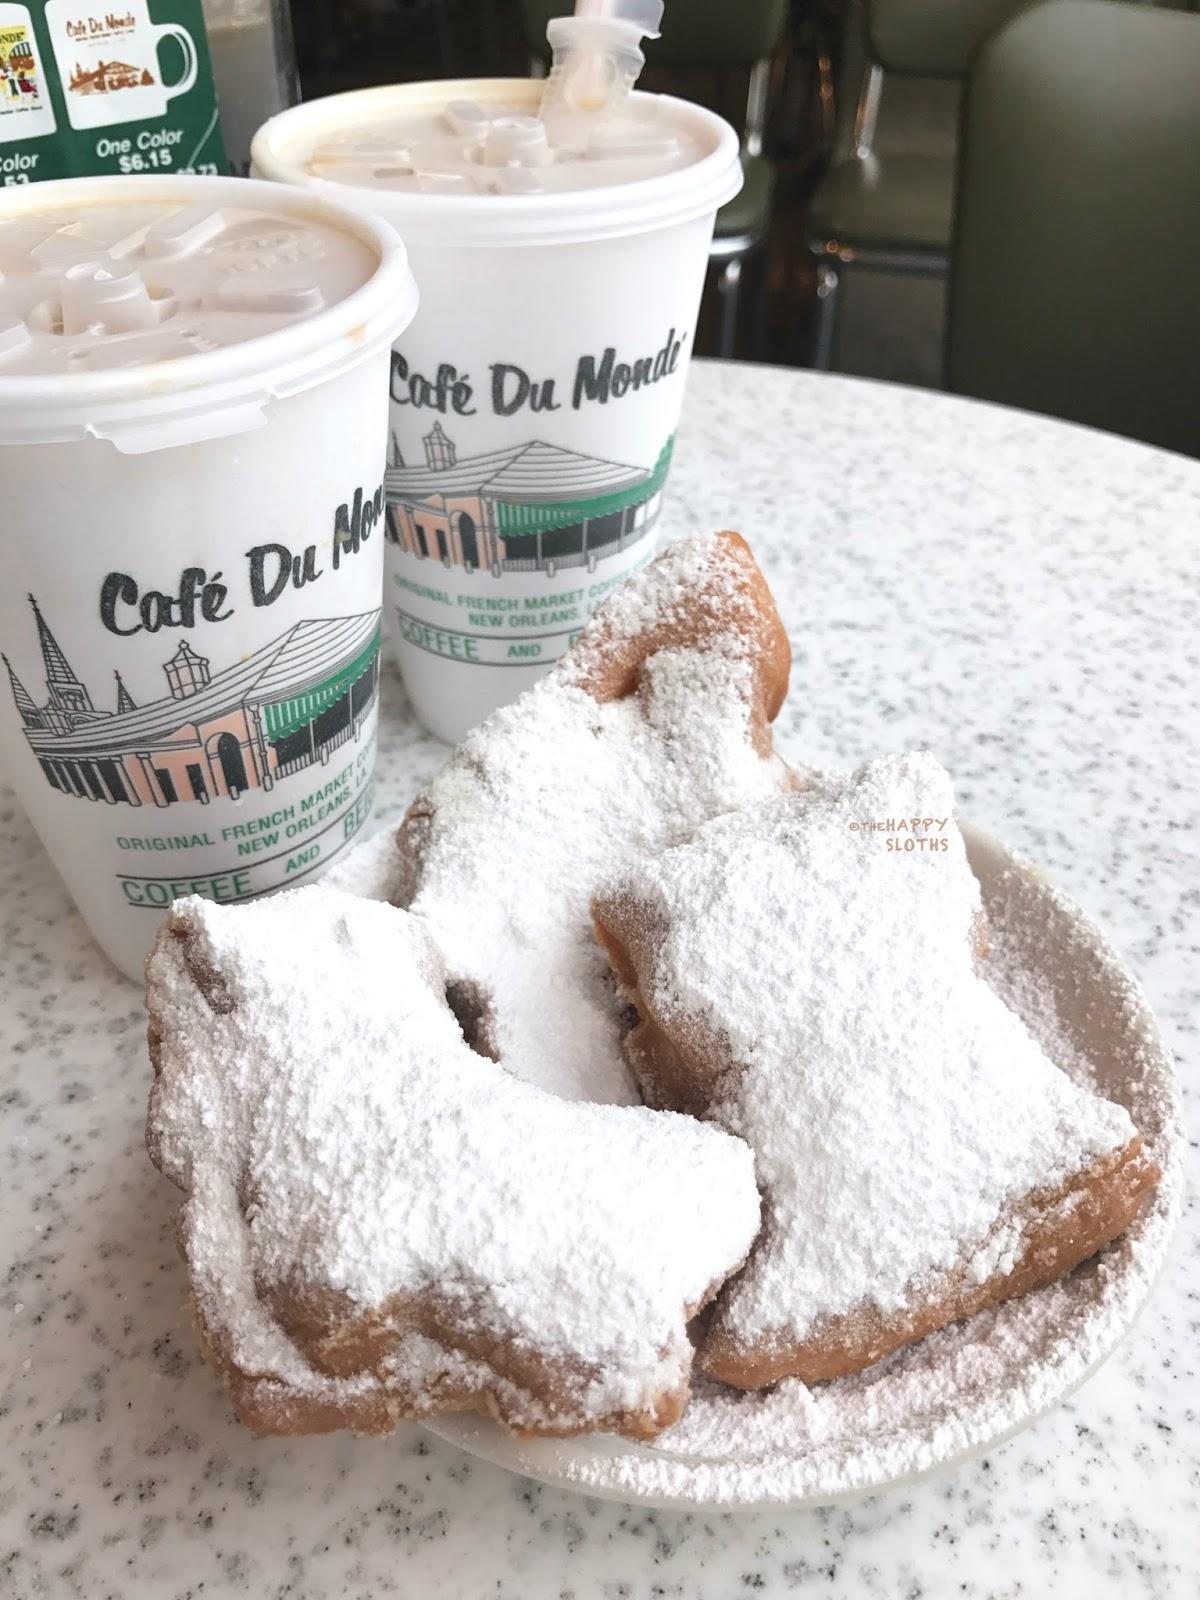 What to Eat in New Orleans: Cafe du Monde | Cafe au Lait & Beignet